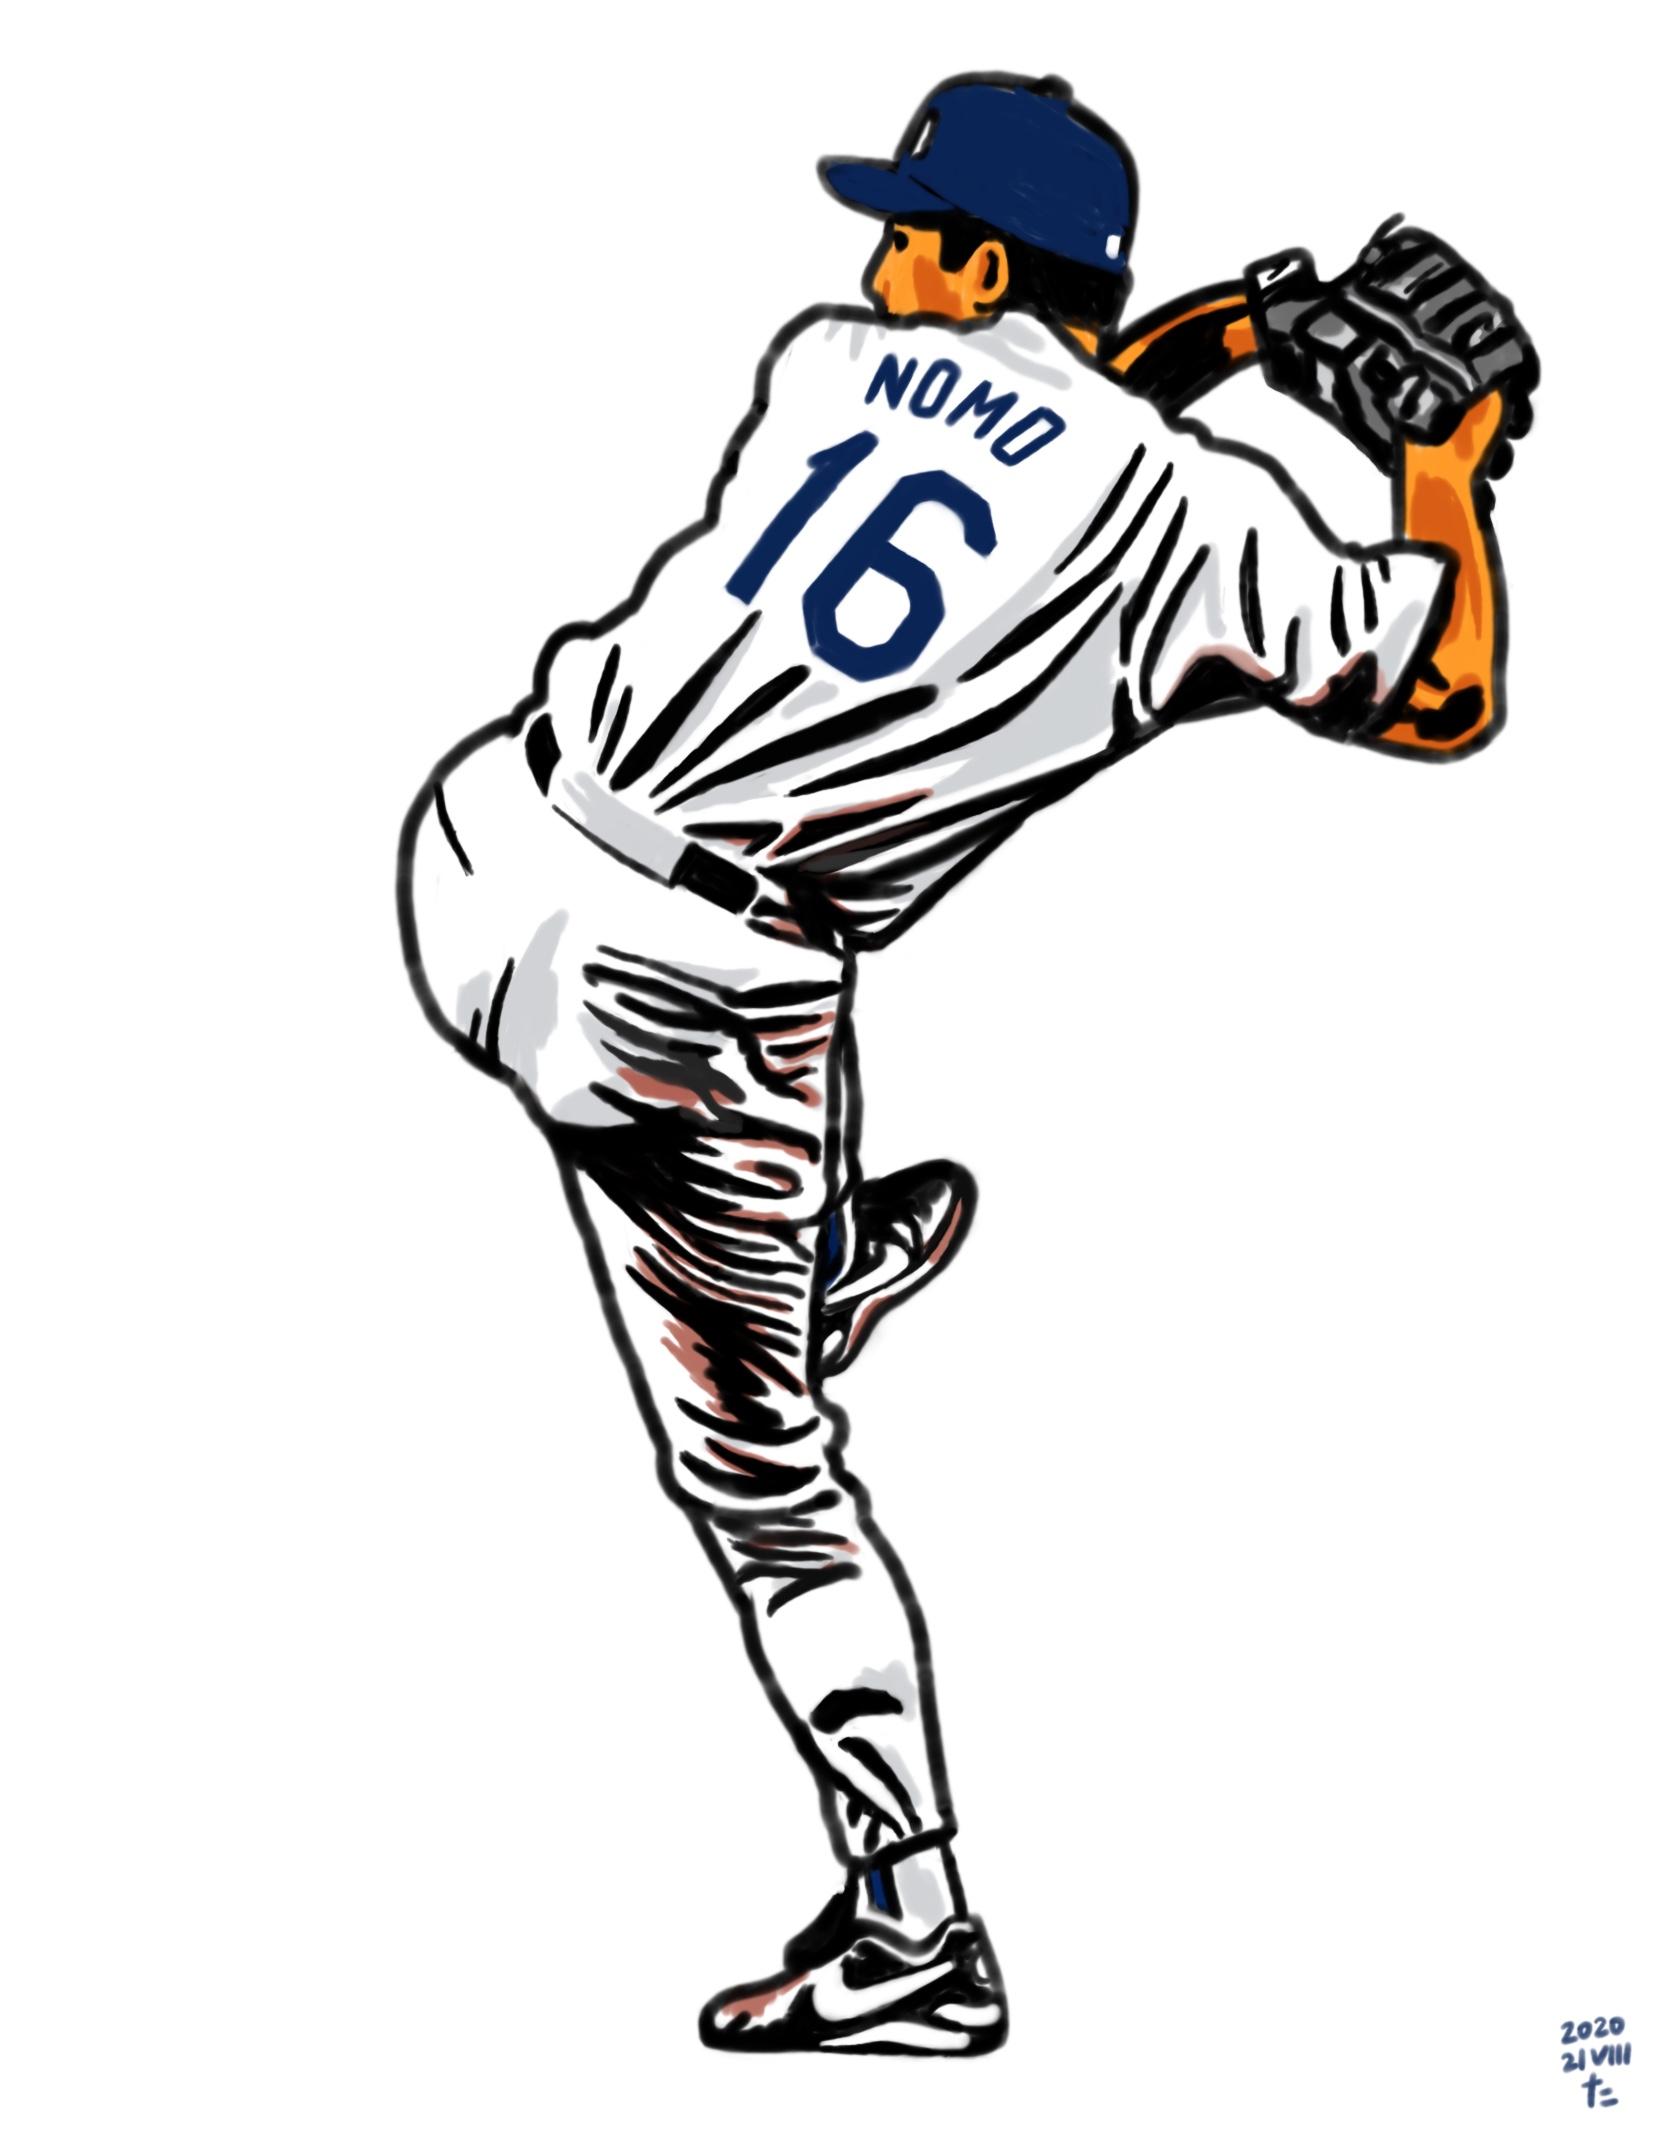 illustration of Los Angeles Dodgers Hideo Nomo's Tornado Pitch